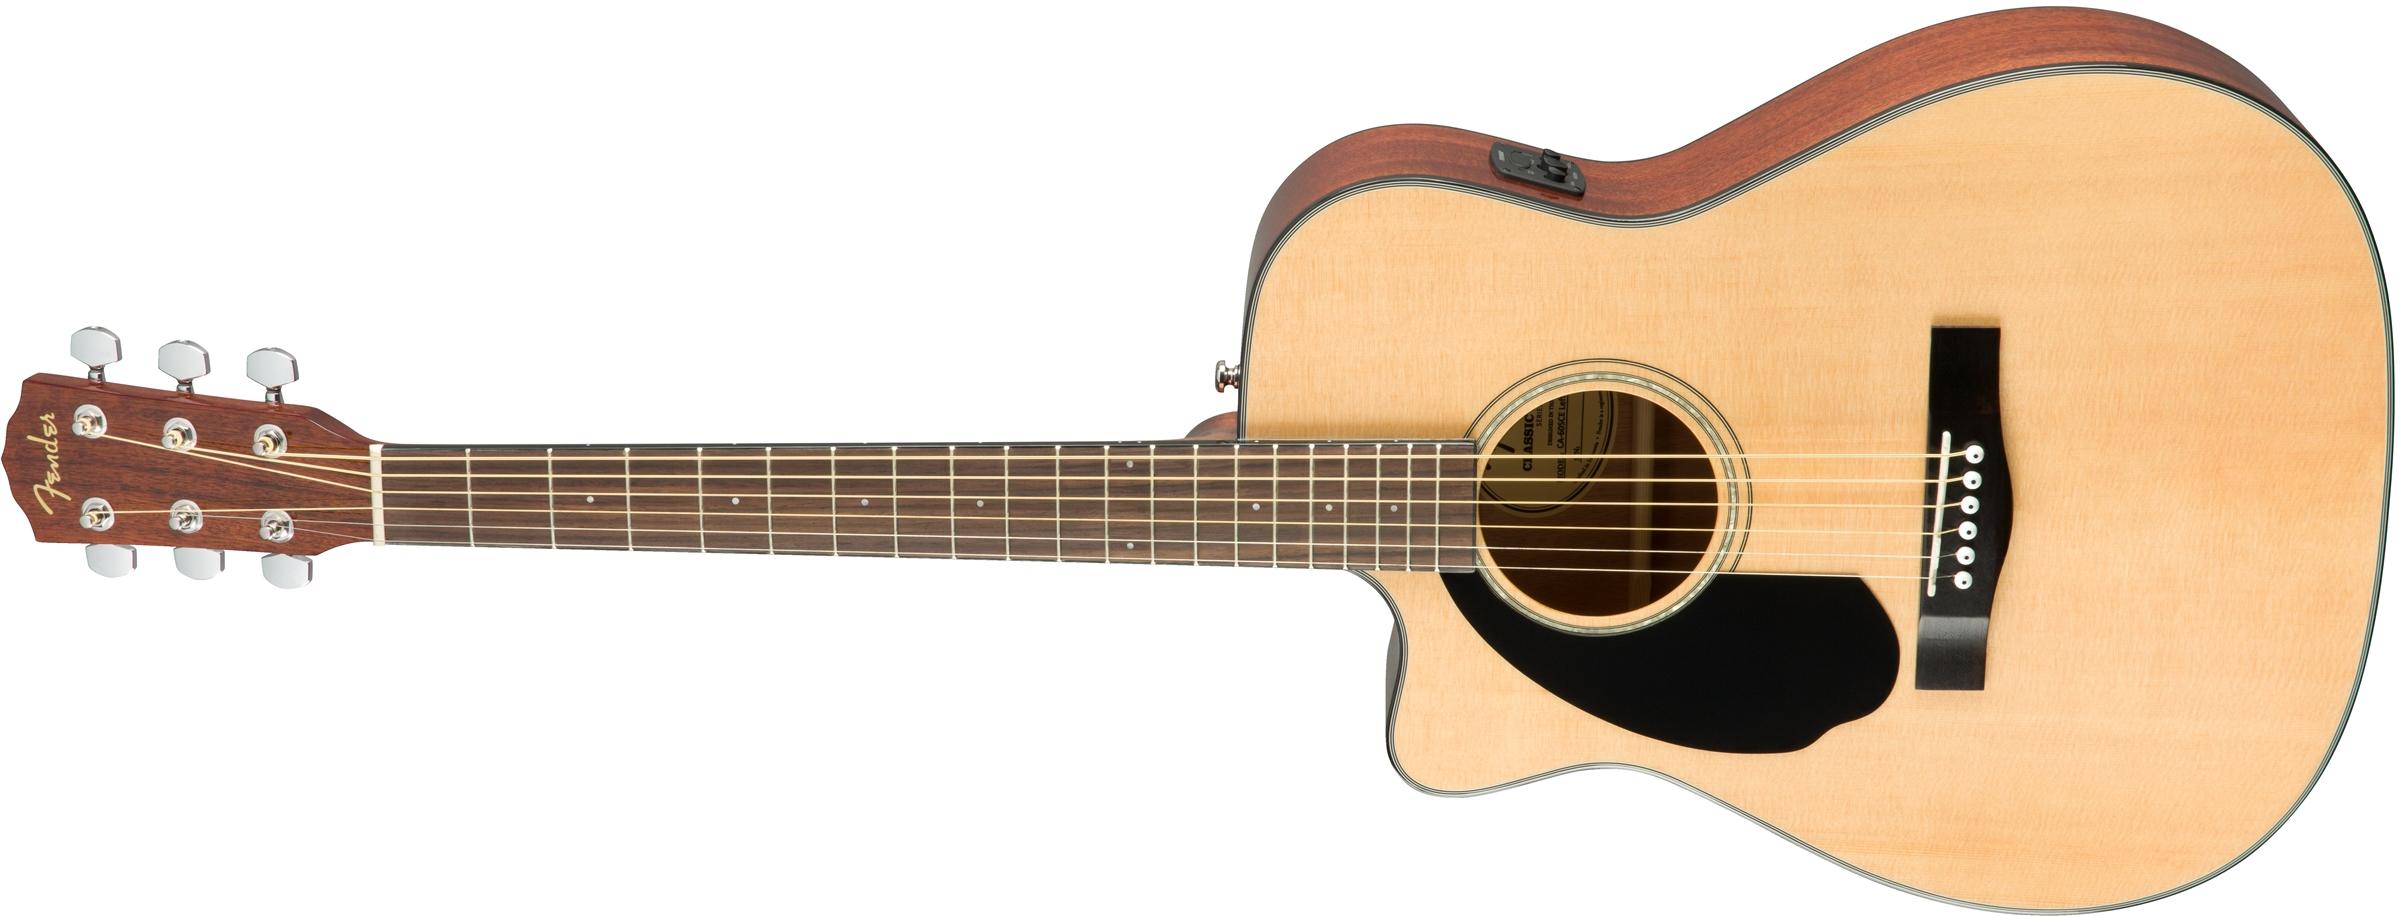 Guitars & Basses Authorized Dealer Fender Cc-60sce Natural